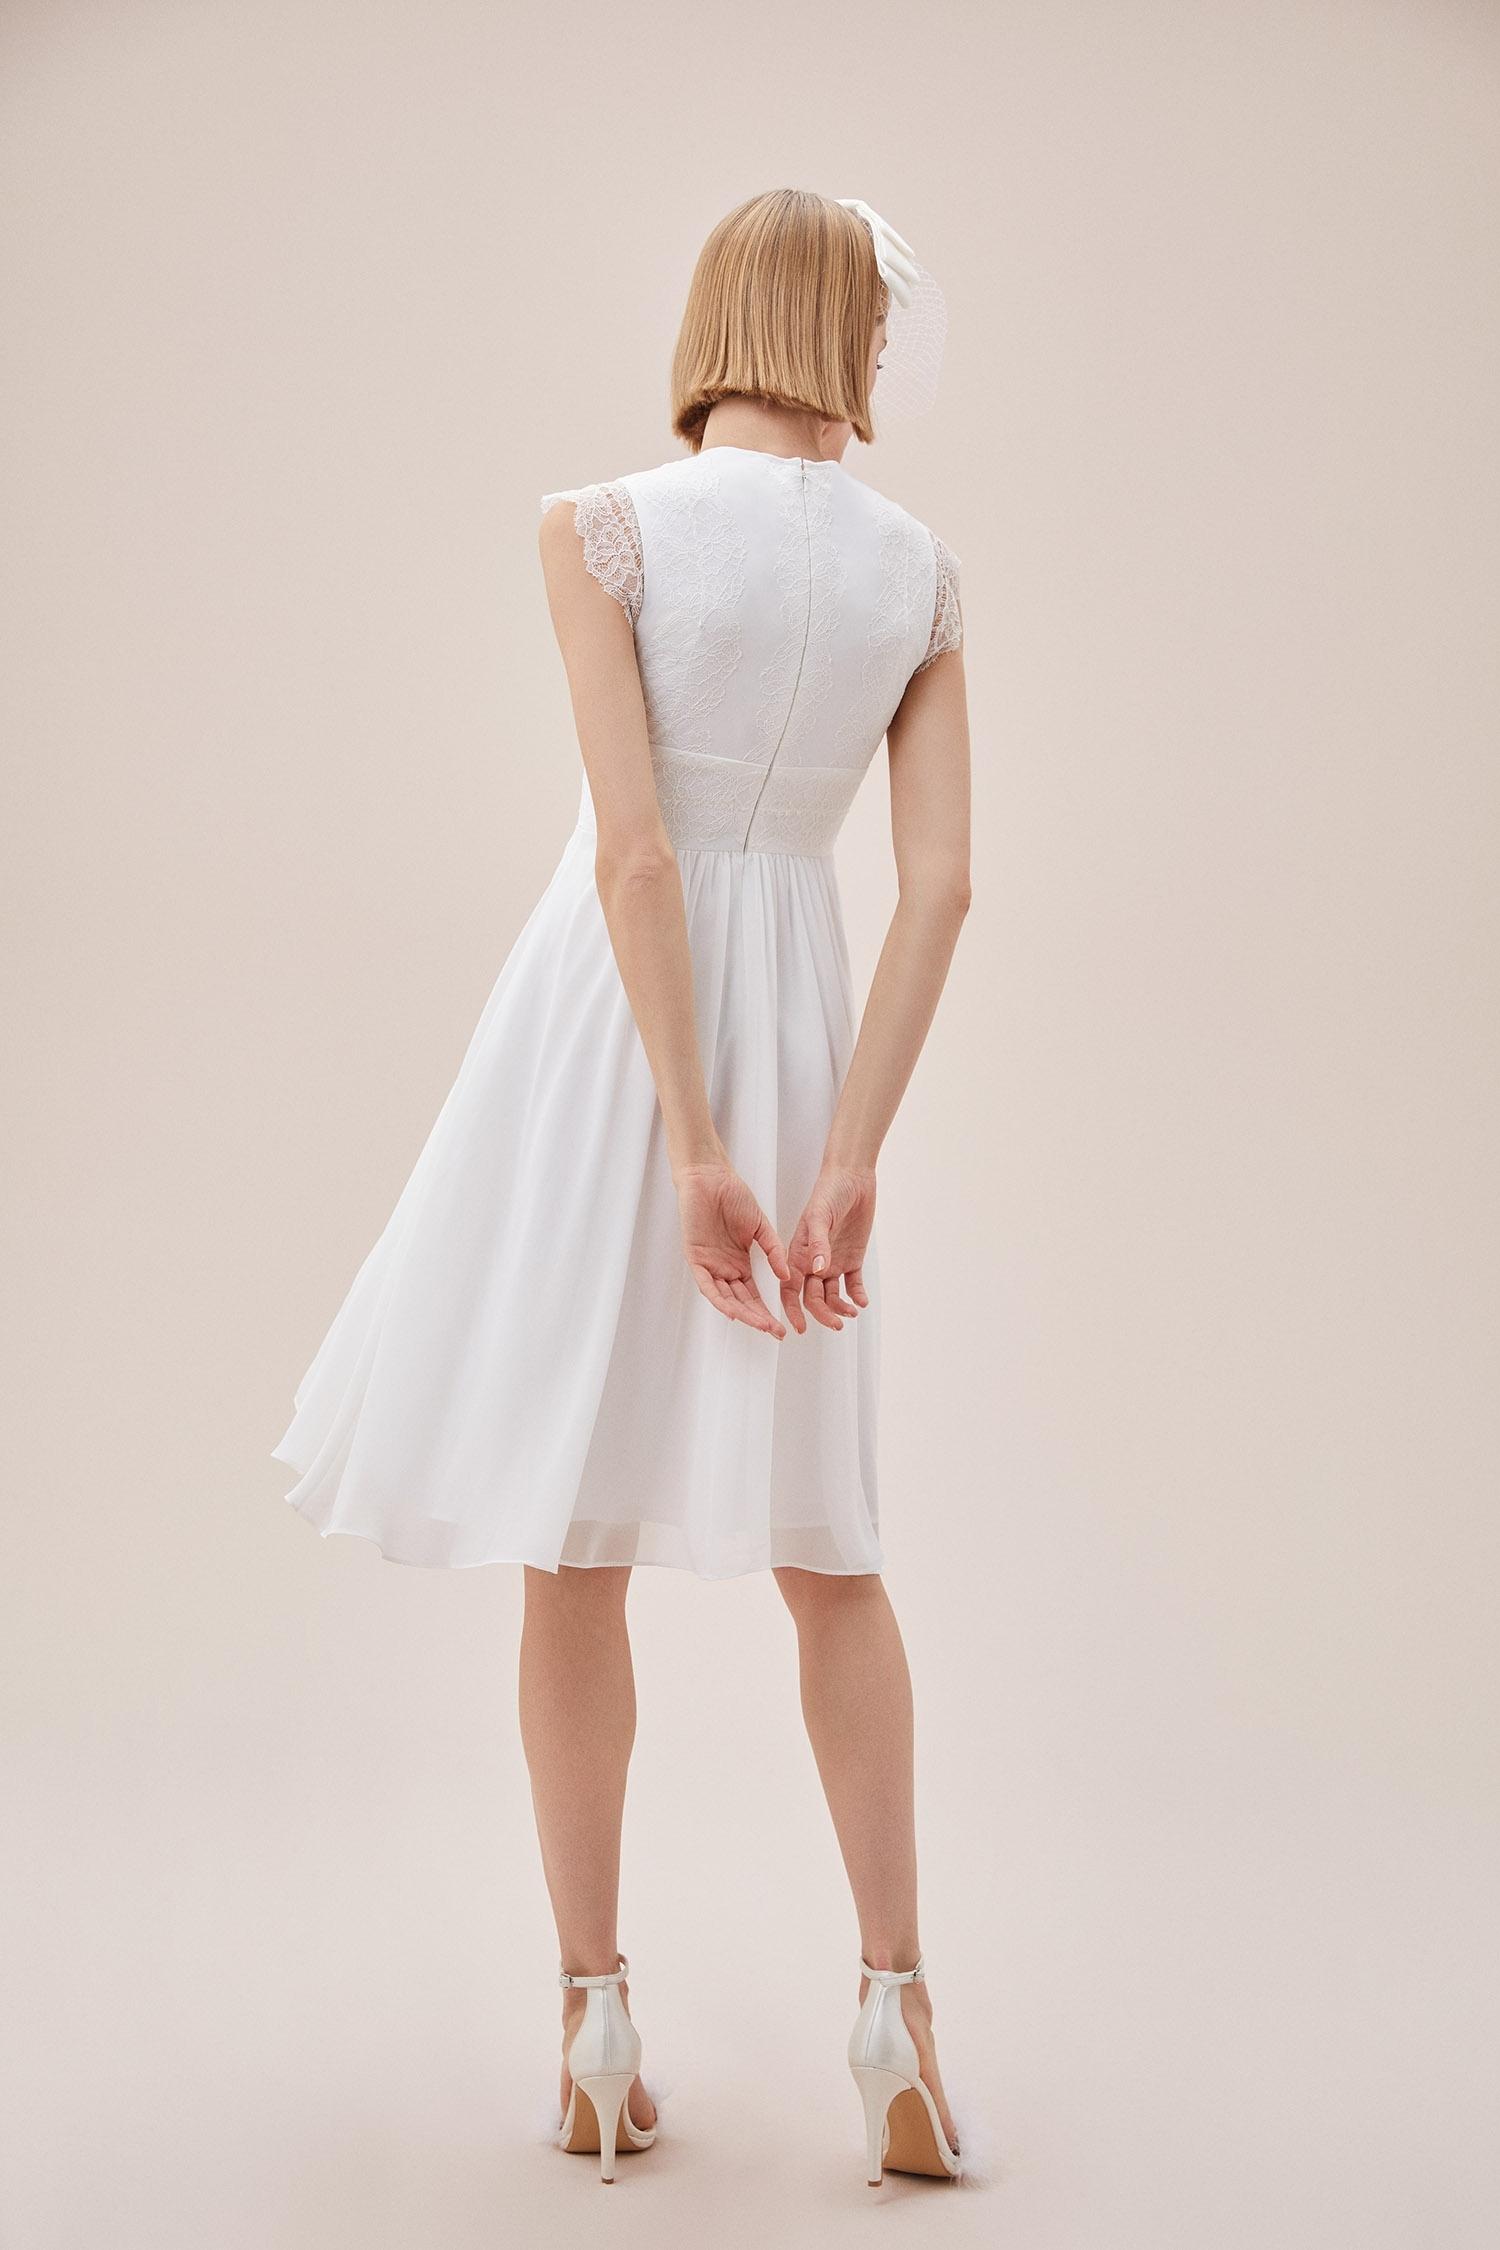 Beyaz Kap Kol Şifon Midi Boy Nikah Elbisesi - Thumbnail